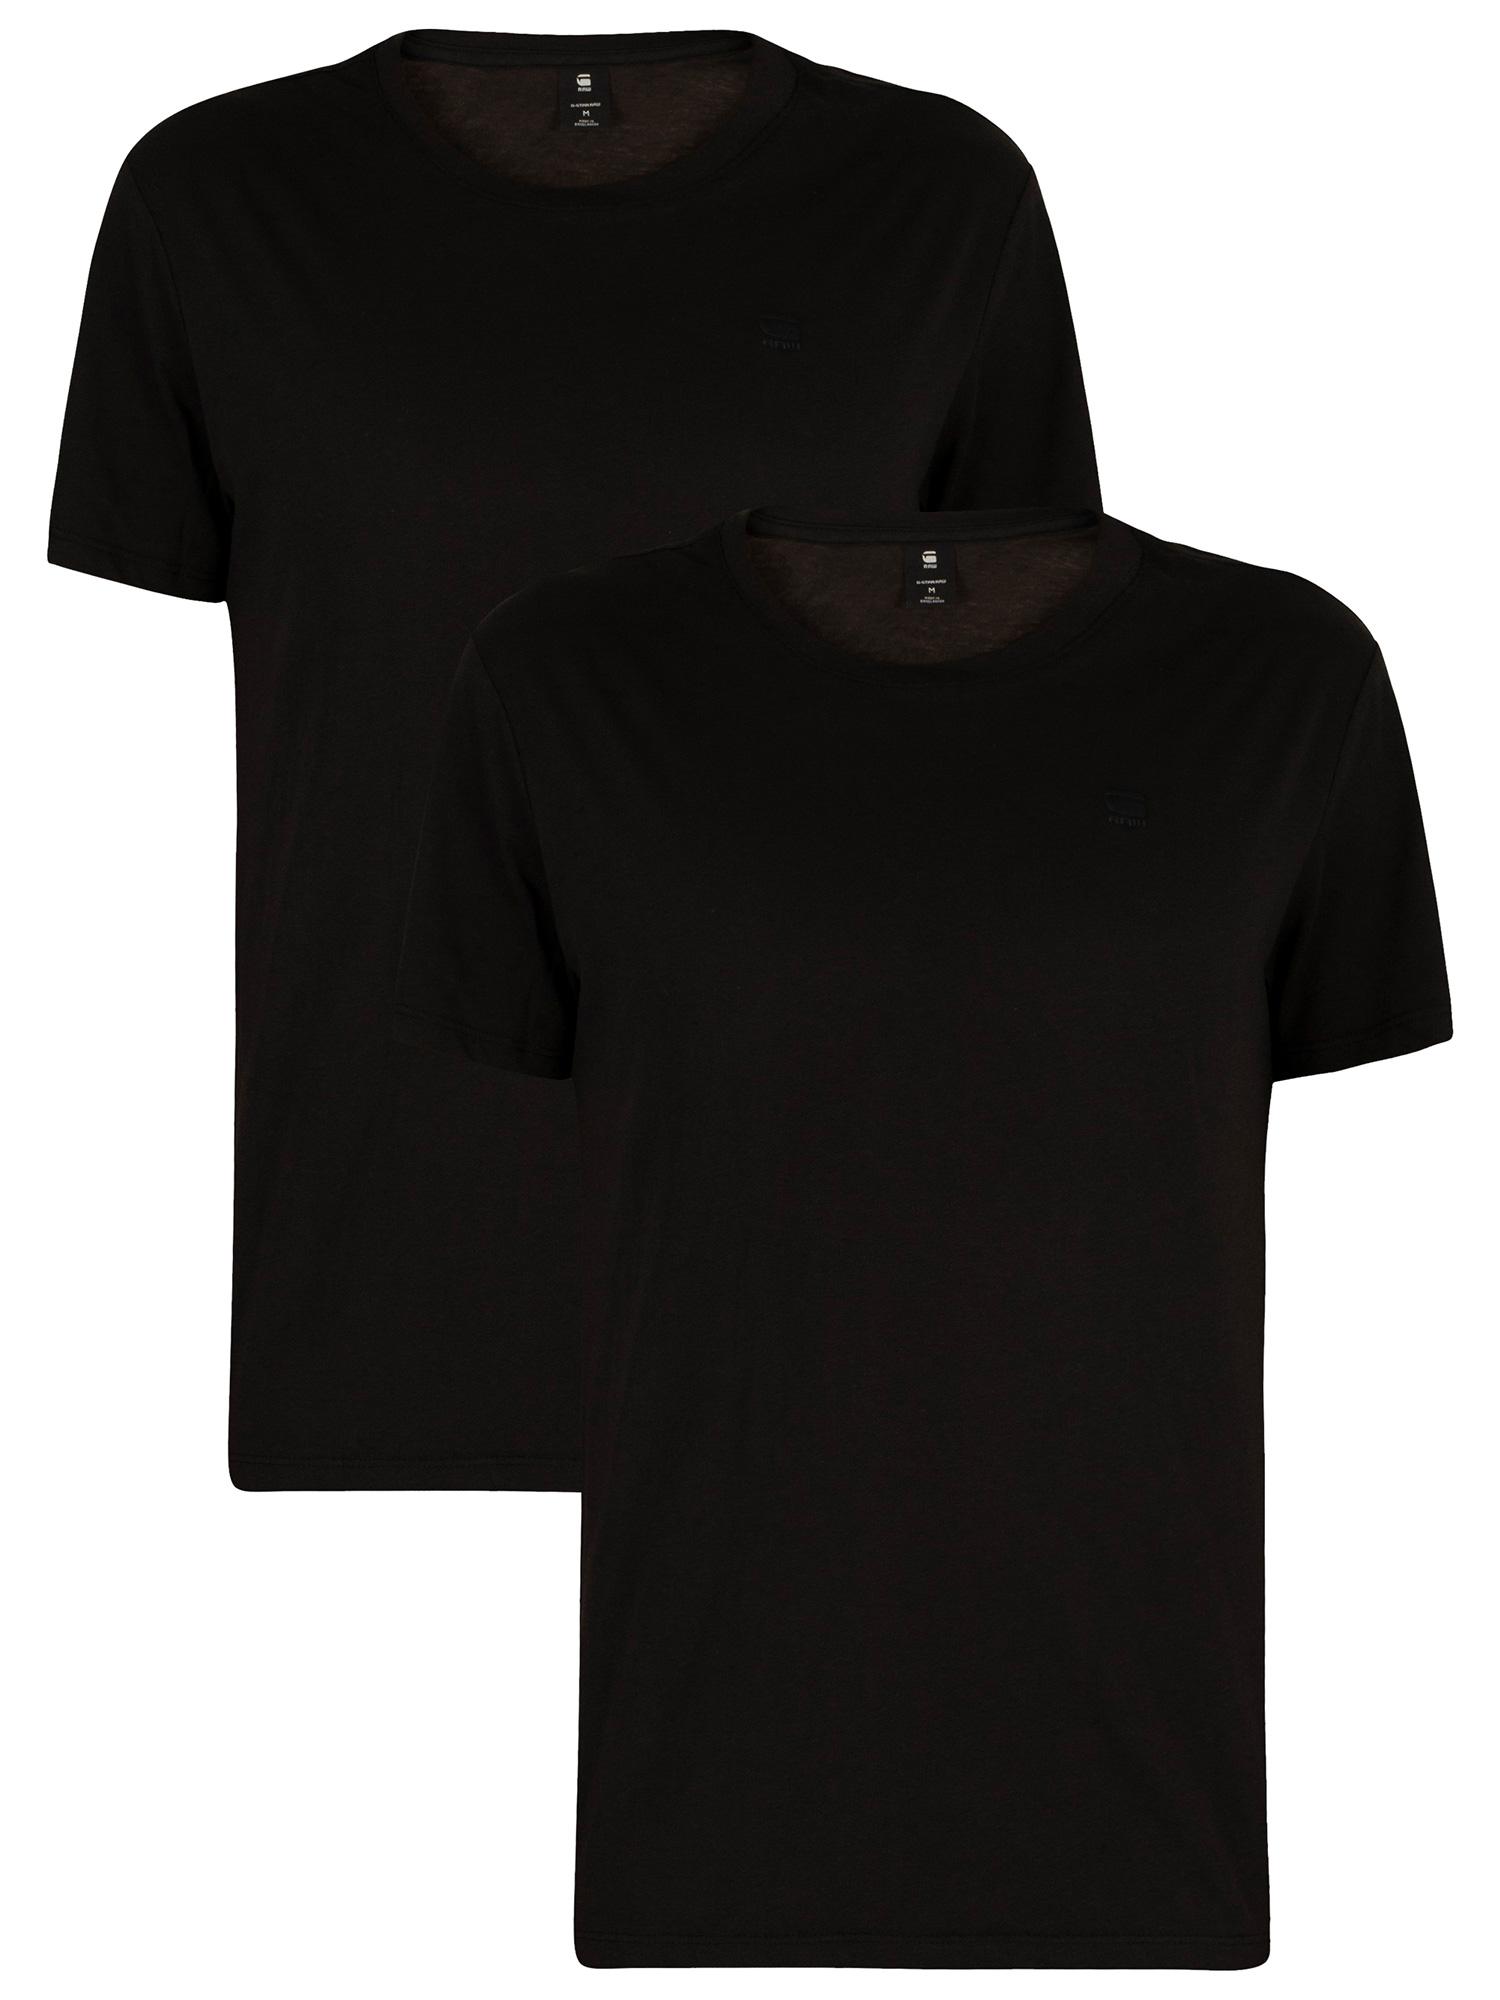 2-Pack-Crew-TShirts